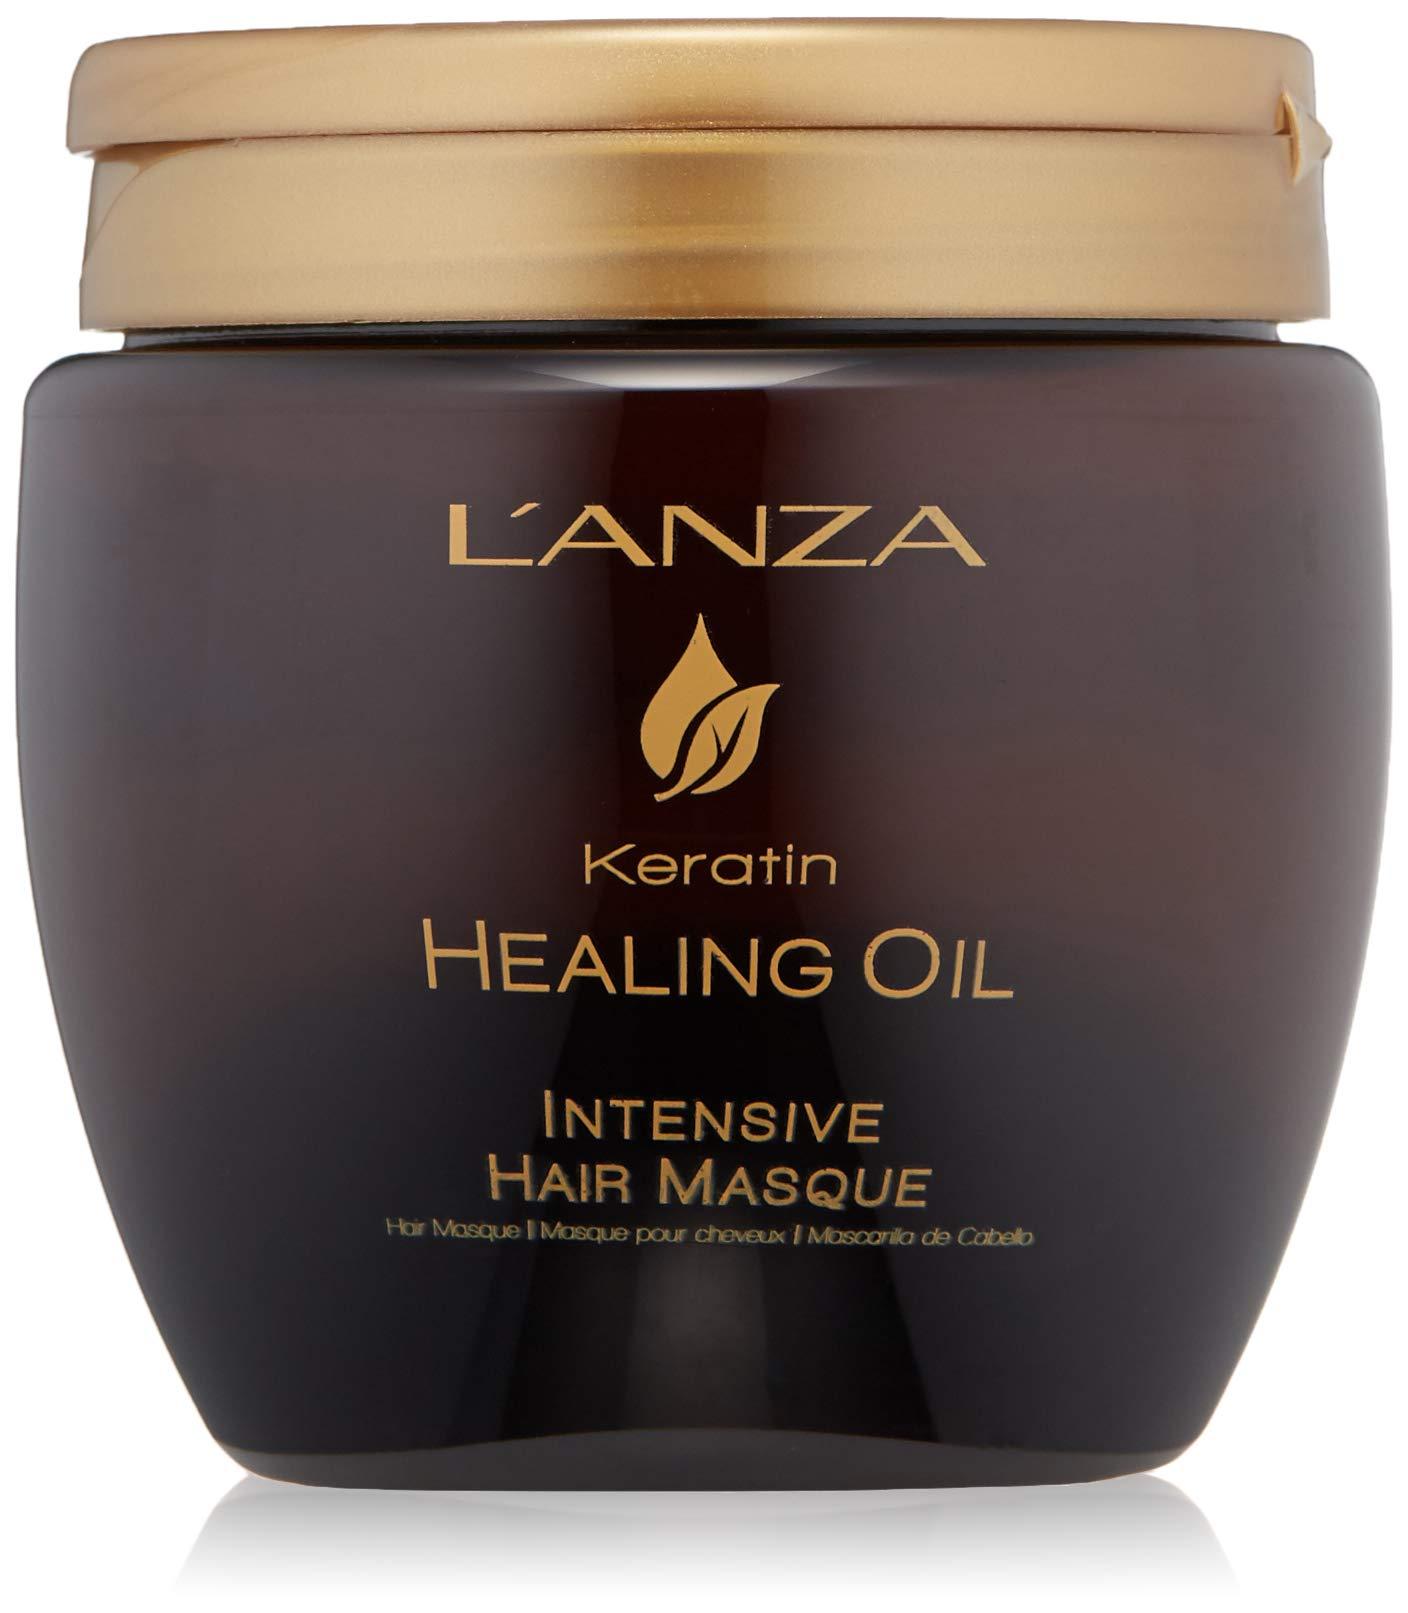 L'ANZA Keratin Healing Oil Intensive Hair Masque, 7.1 oz. by L'ANZA (Image #1)